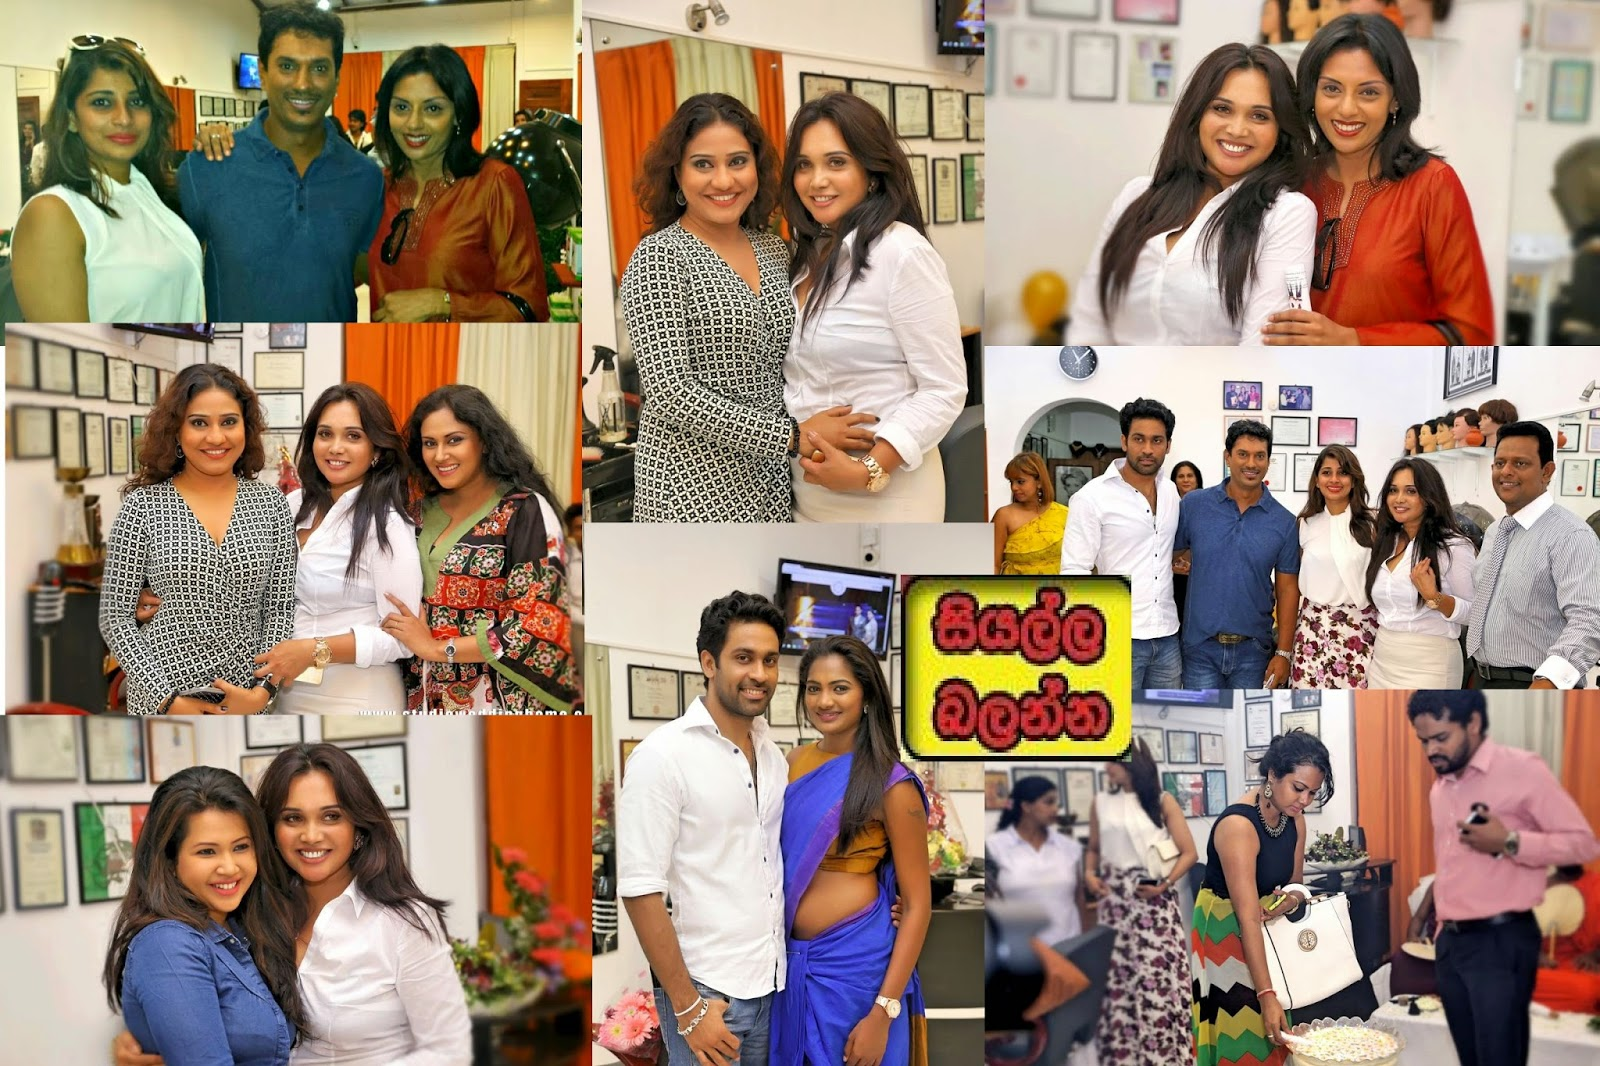 http://picture.gossiplankahotnews.com/2015/02/salon-gayathri-opening.html